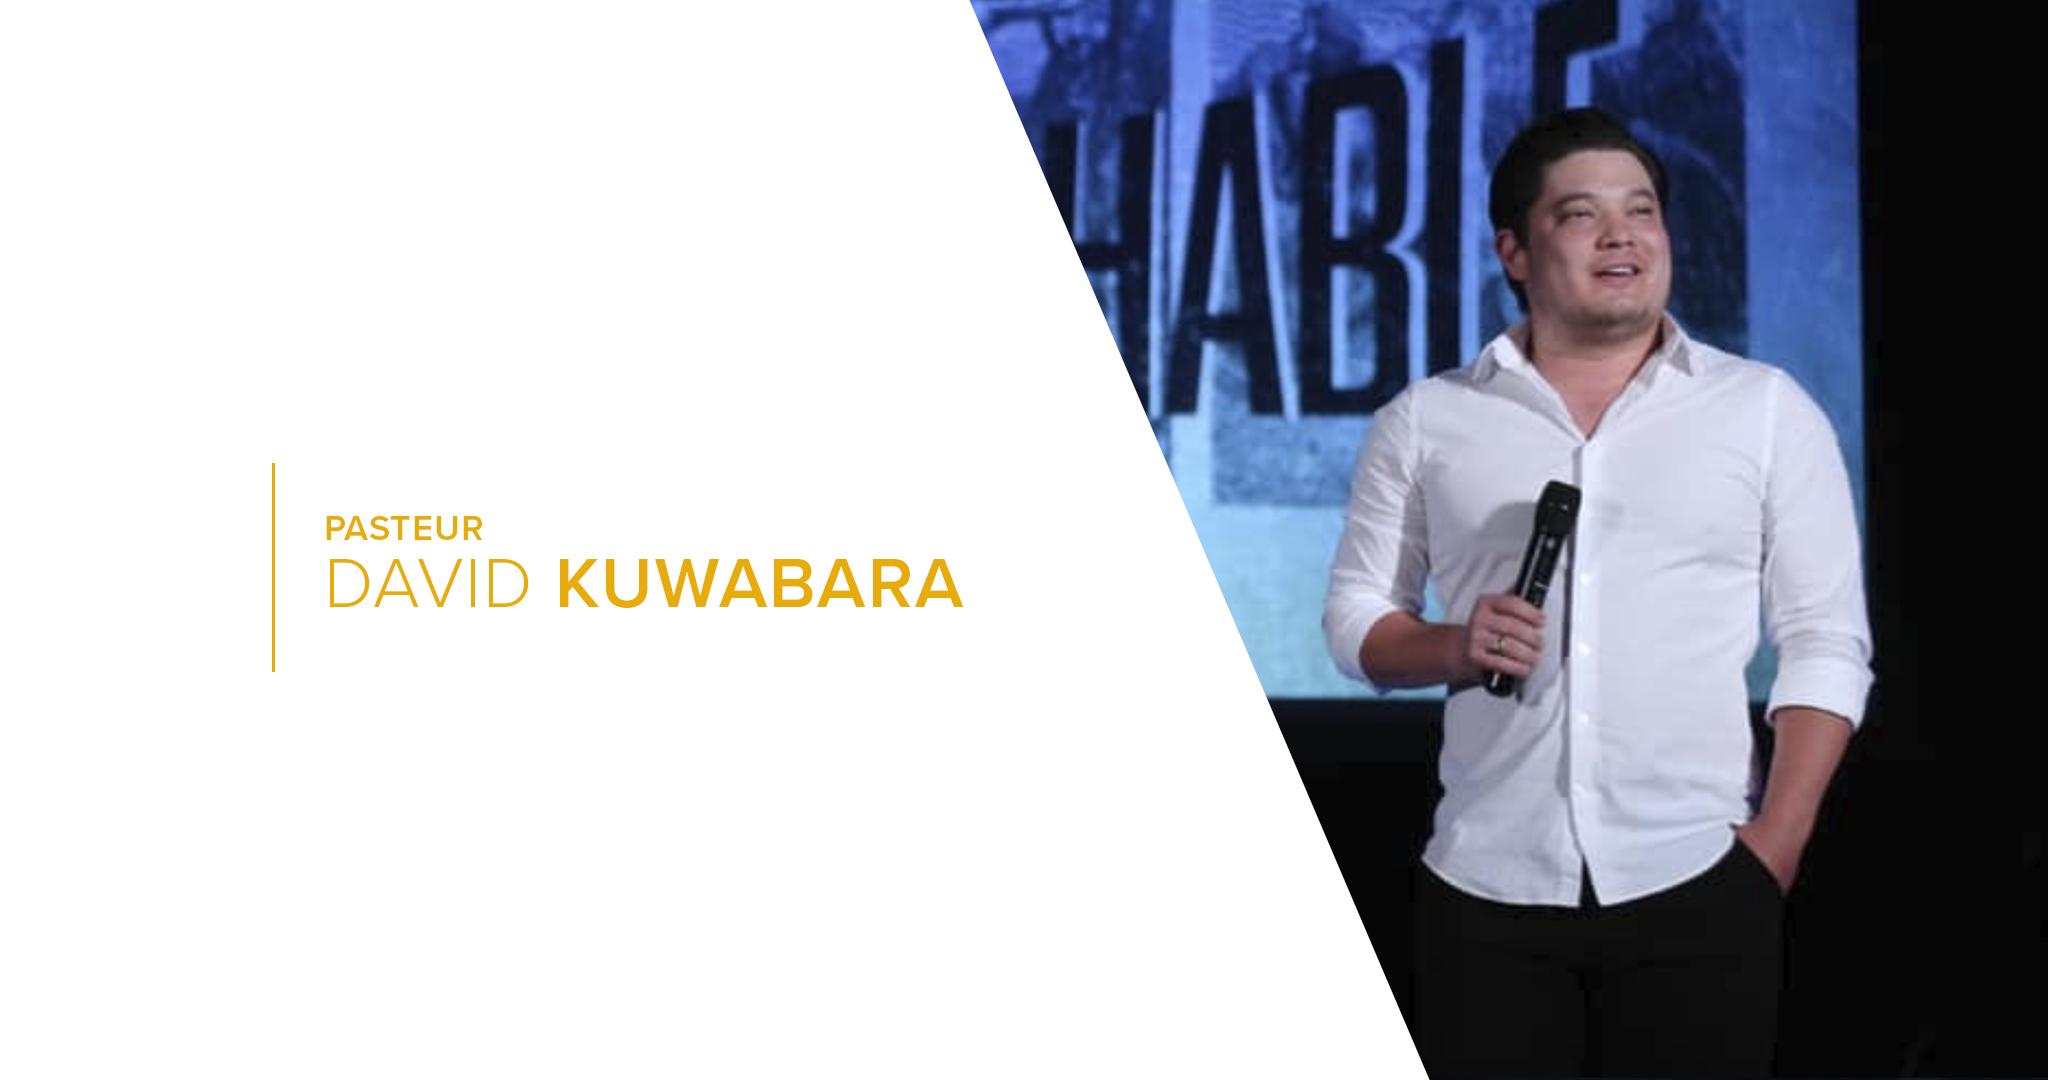 2018-11-11_LVC_Invité - David Kuwabara.jpg